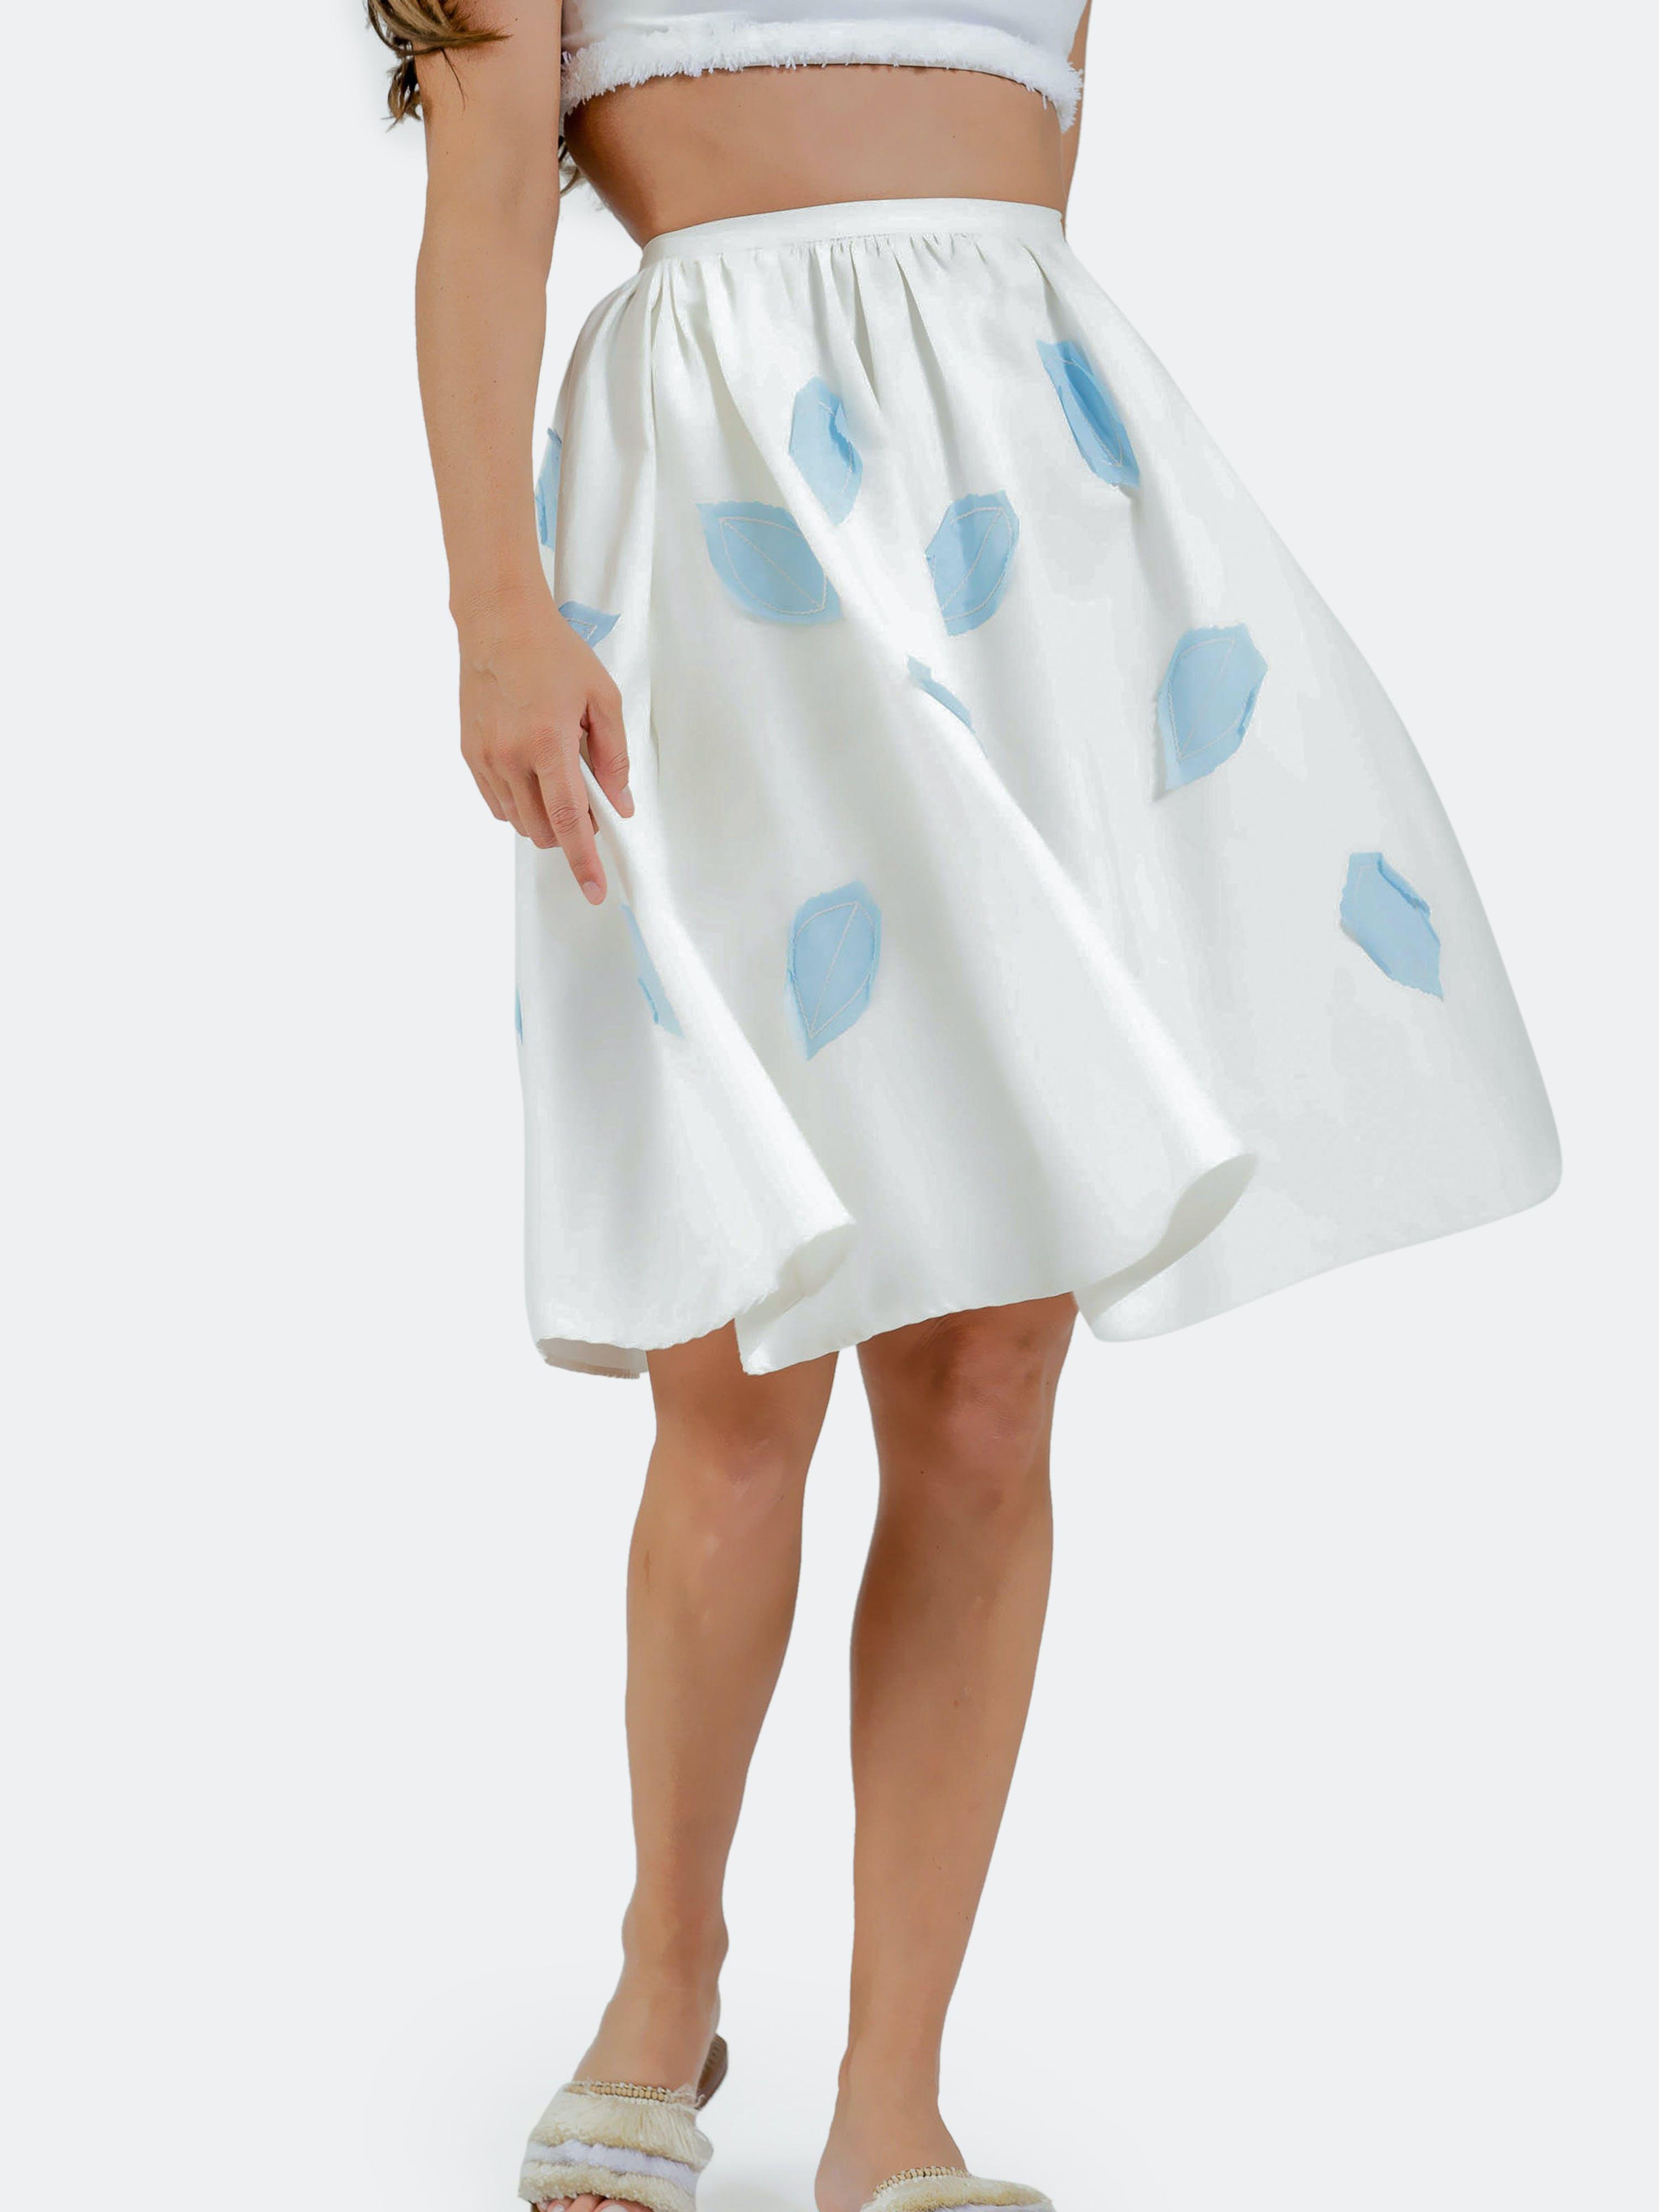 Palmier Meadow Lane Garden Skirt - M - Also in: S, L, XS  - White